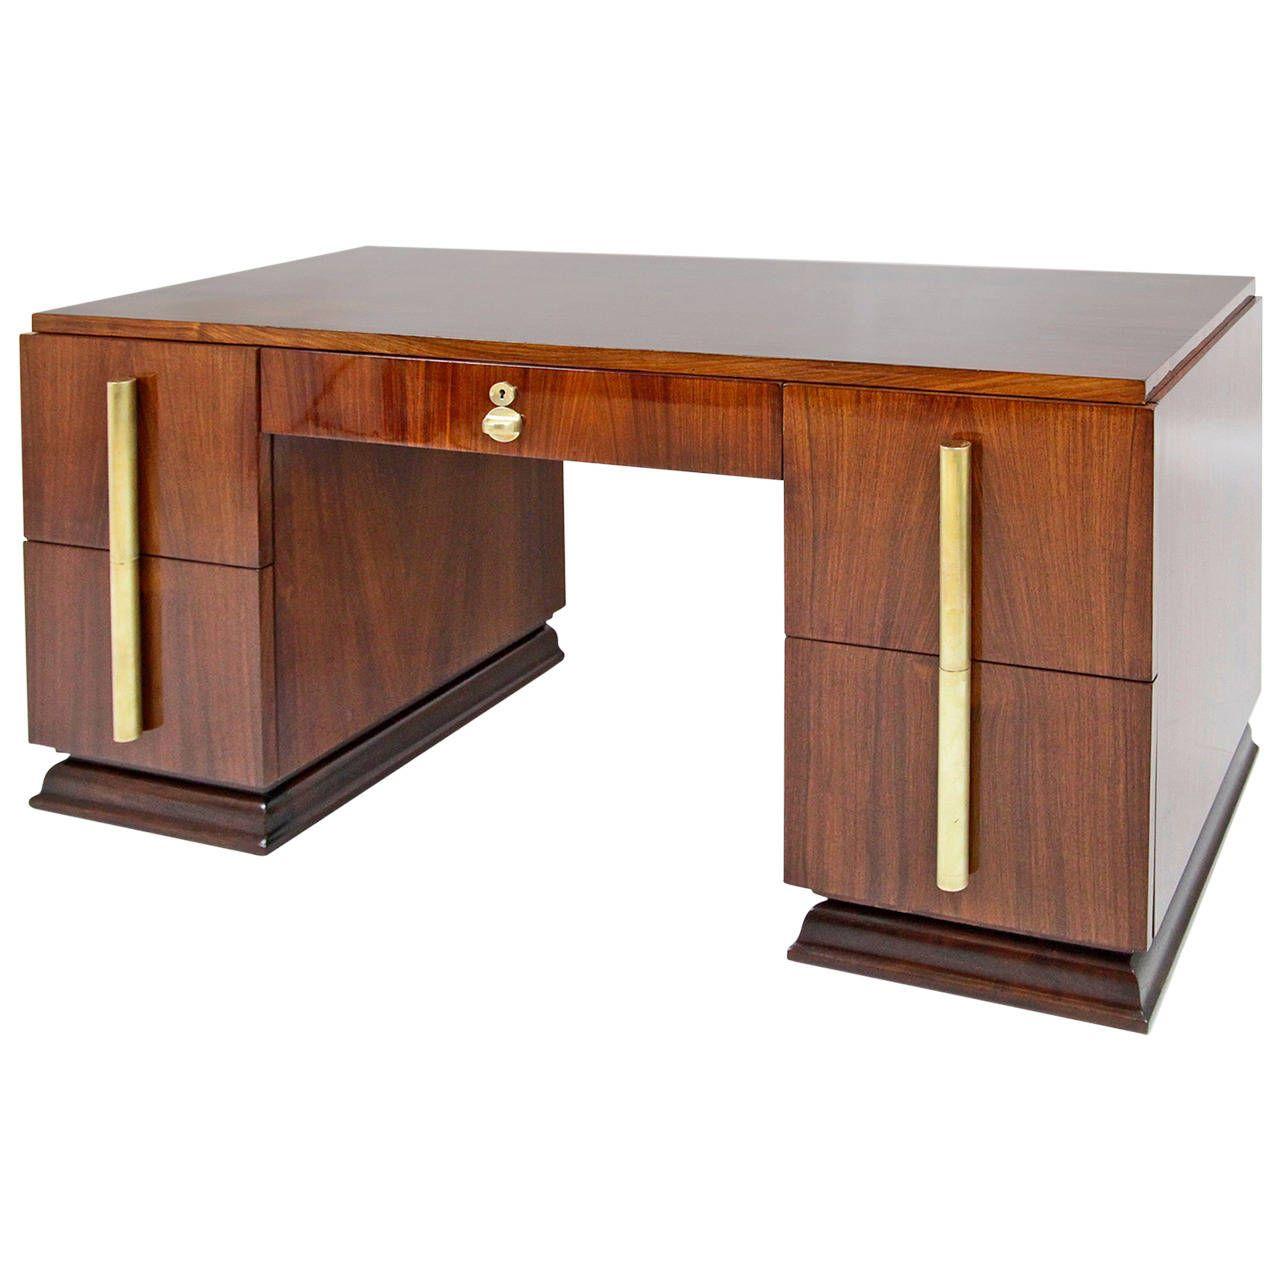 High Quality French Art Deco Desk, Art Deco Corner Writing Desk